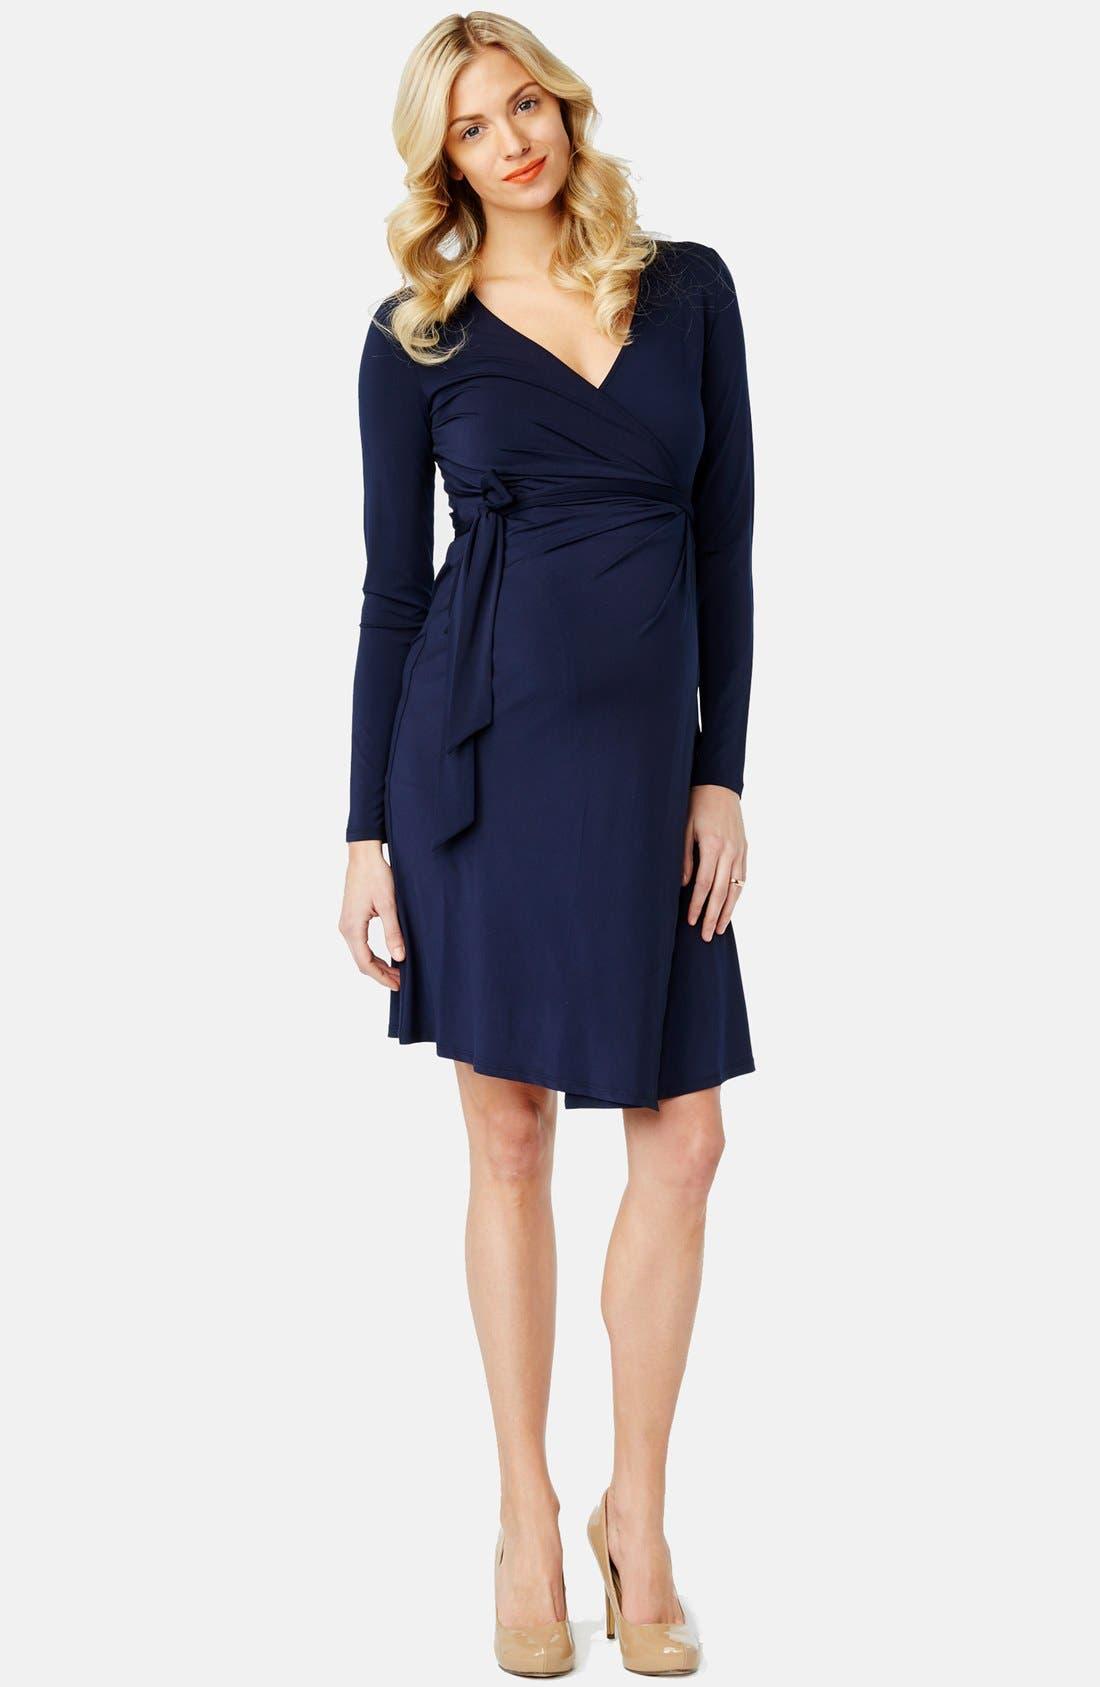 Rosie Pope Wrap Maternity Dress, Blue